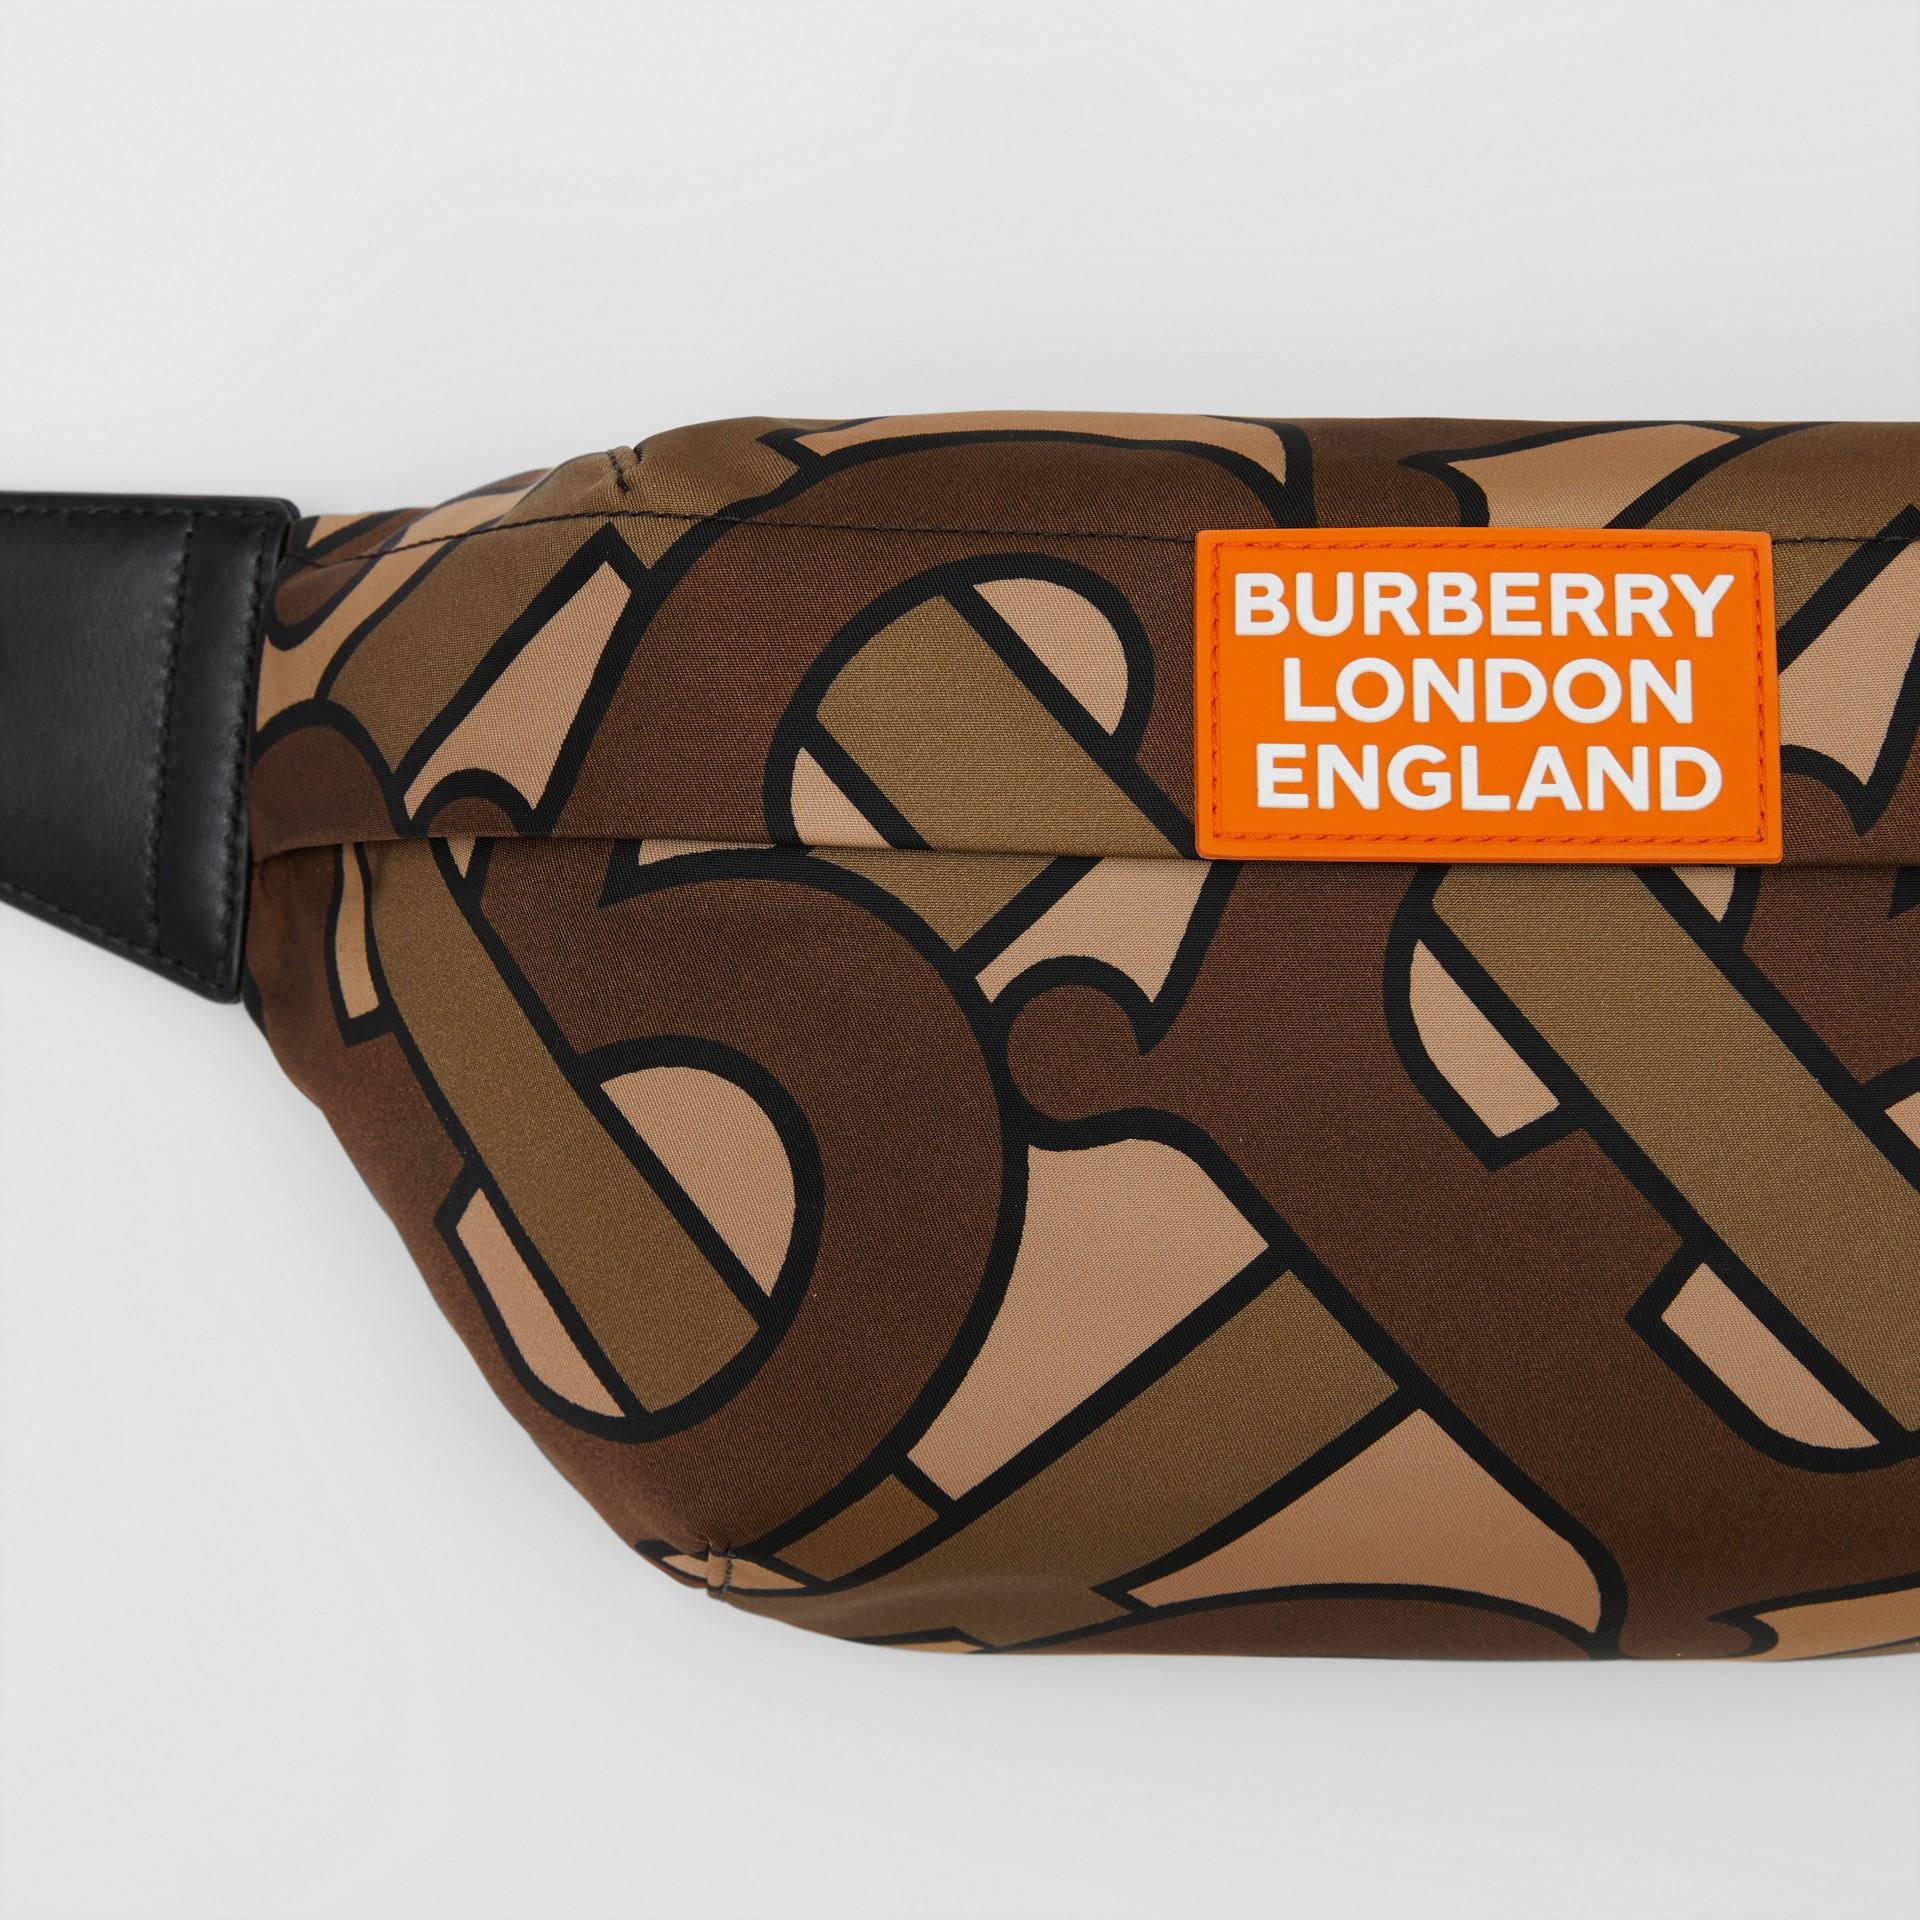 Monogram Print Nylon Sonny Bum Bag in Bridle Brown - Men | Burberry - gallery image 1